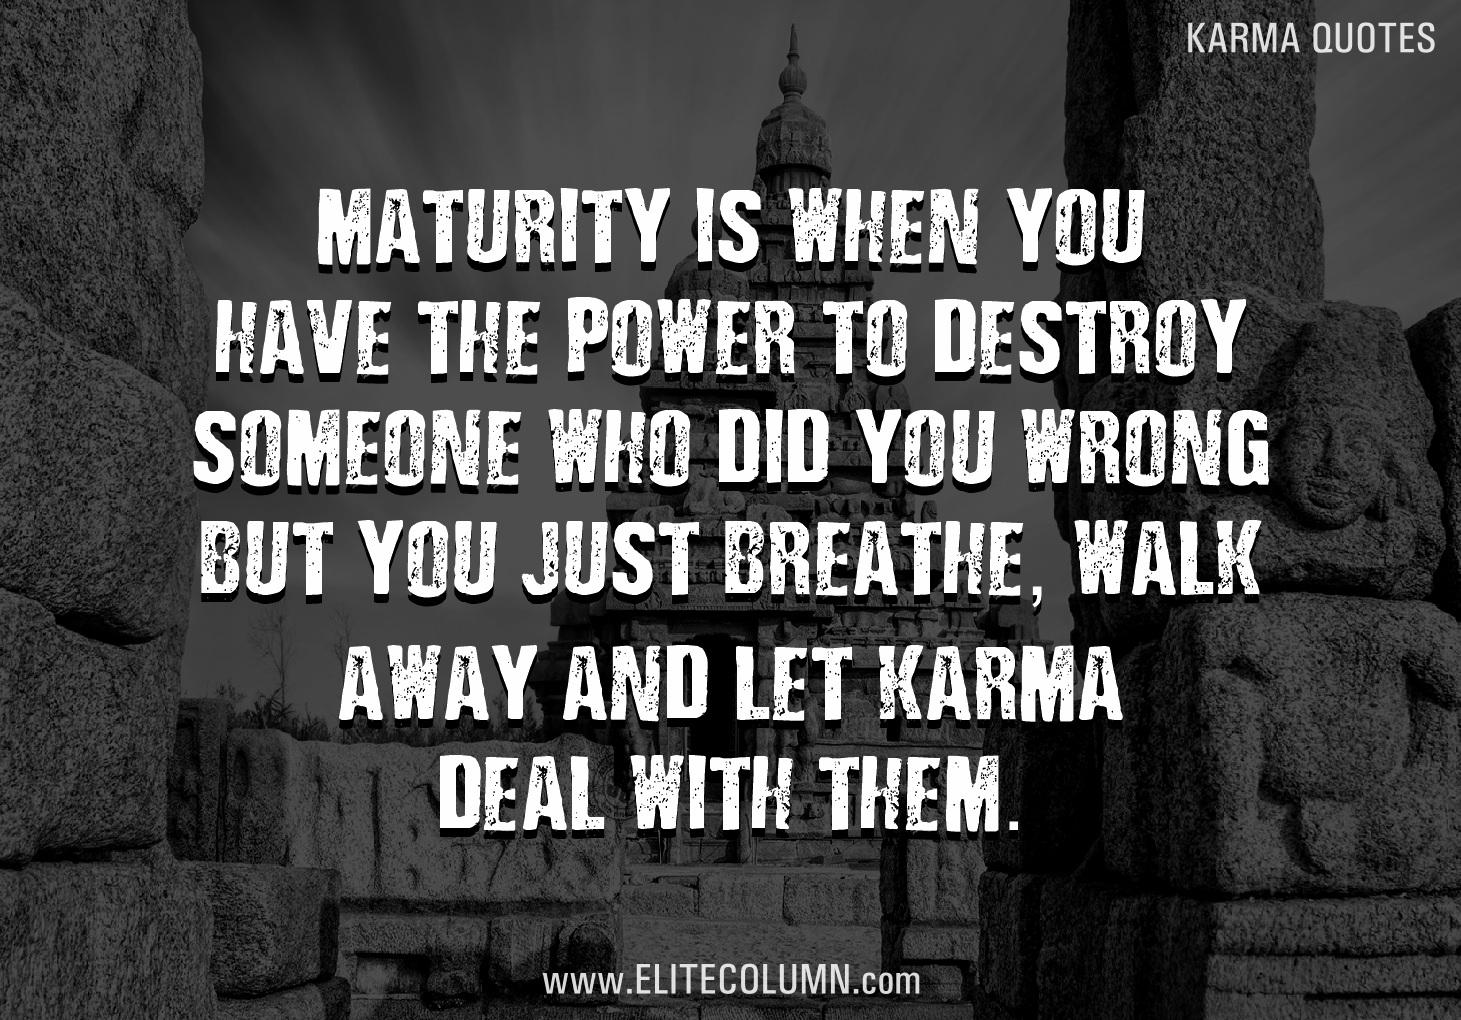 Karma Quotes (4)